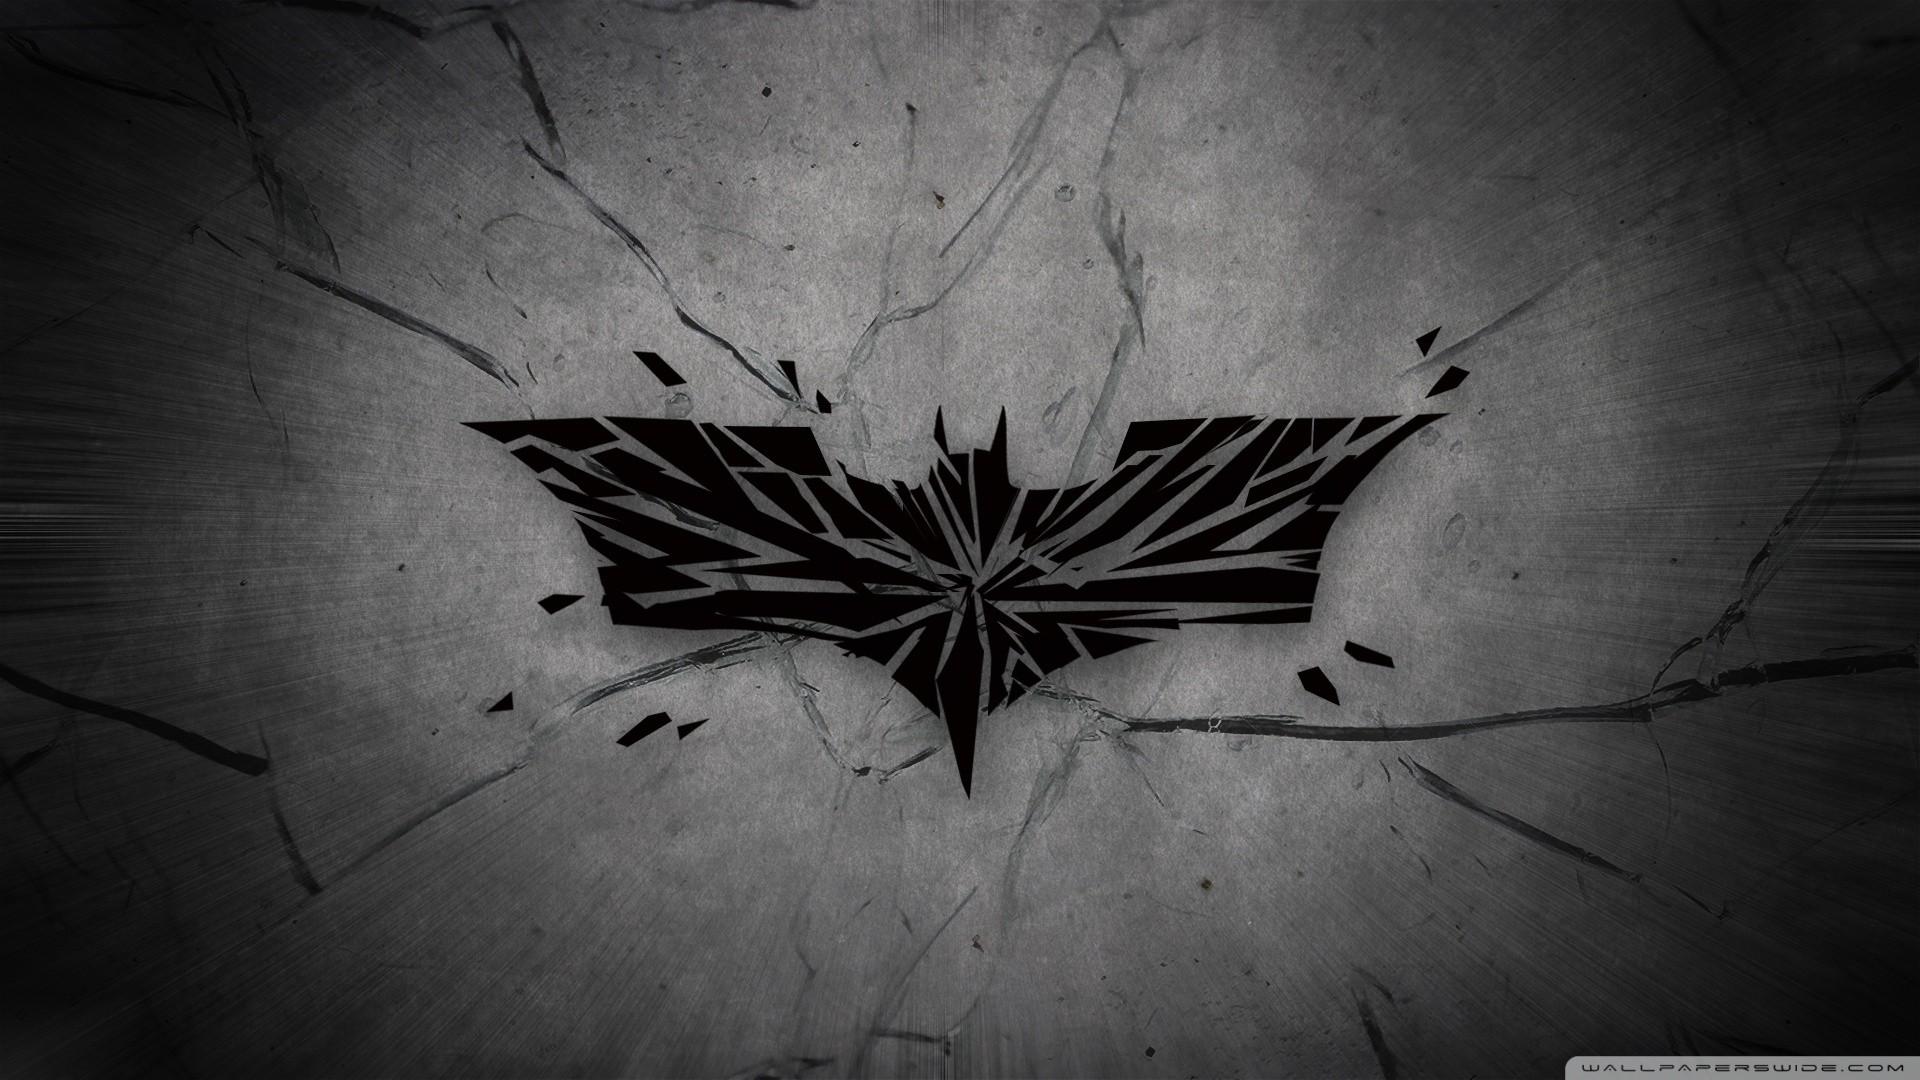 Batman wallpaper hd download free high resolution wallpapers amazing voltagebd Choice Image